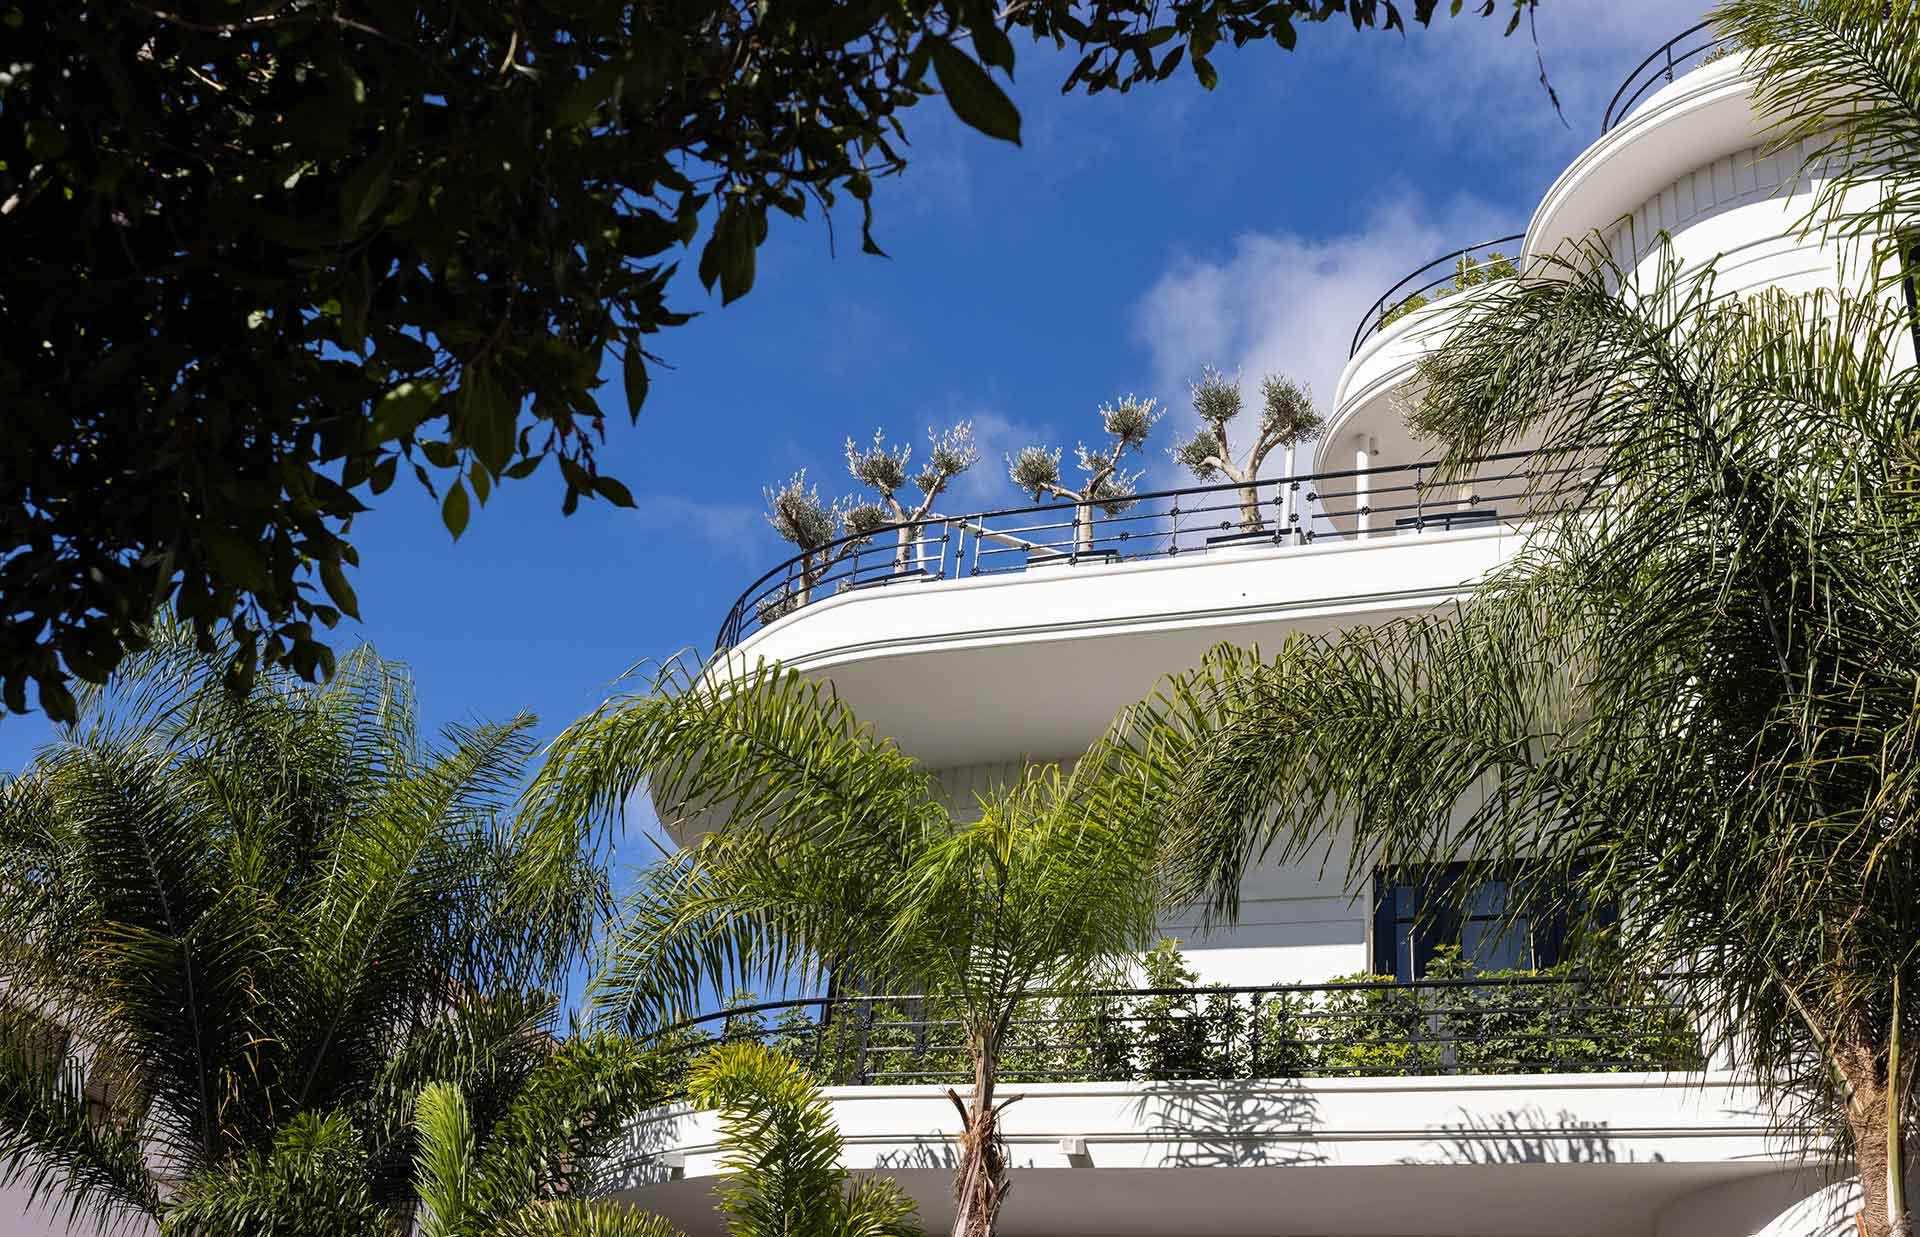 Vivienda en Santa Cruz de Tenerife - Hormigones TAUCE